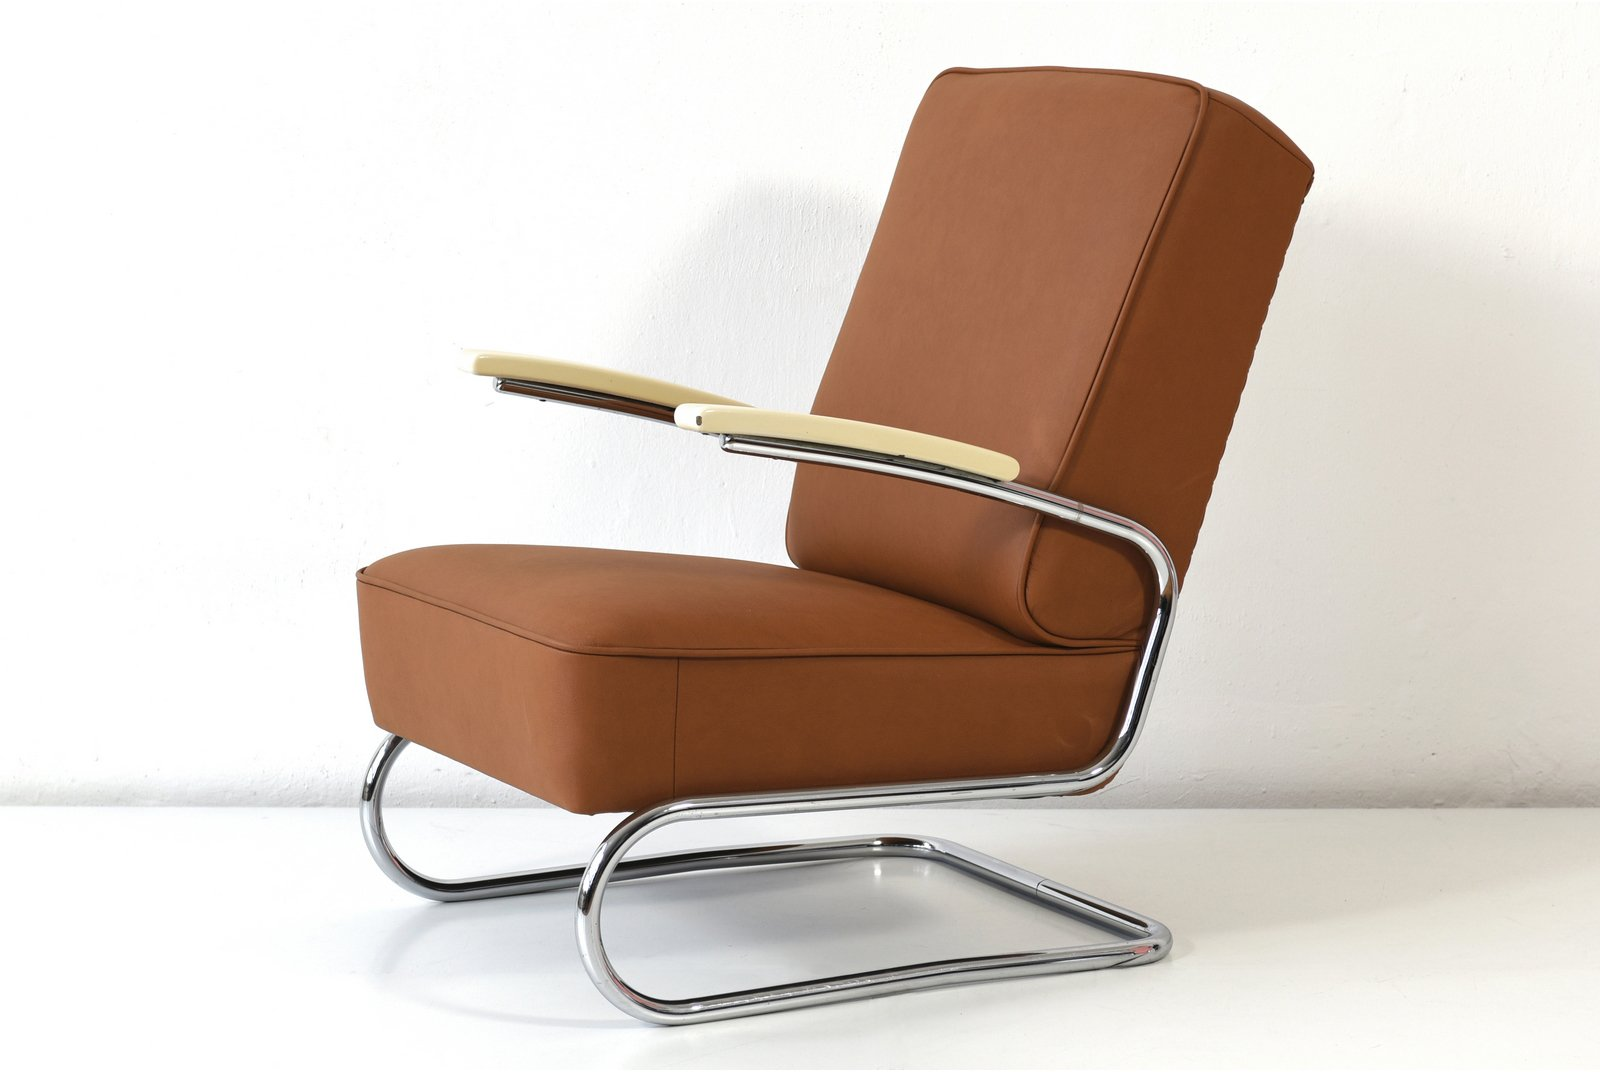 rs 8049 lounge chair from mauser 1950s cafe konrad vib. Black Bedroom Furniture Sets. Home Design Ideas